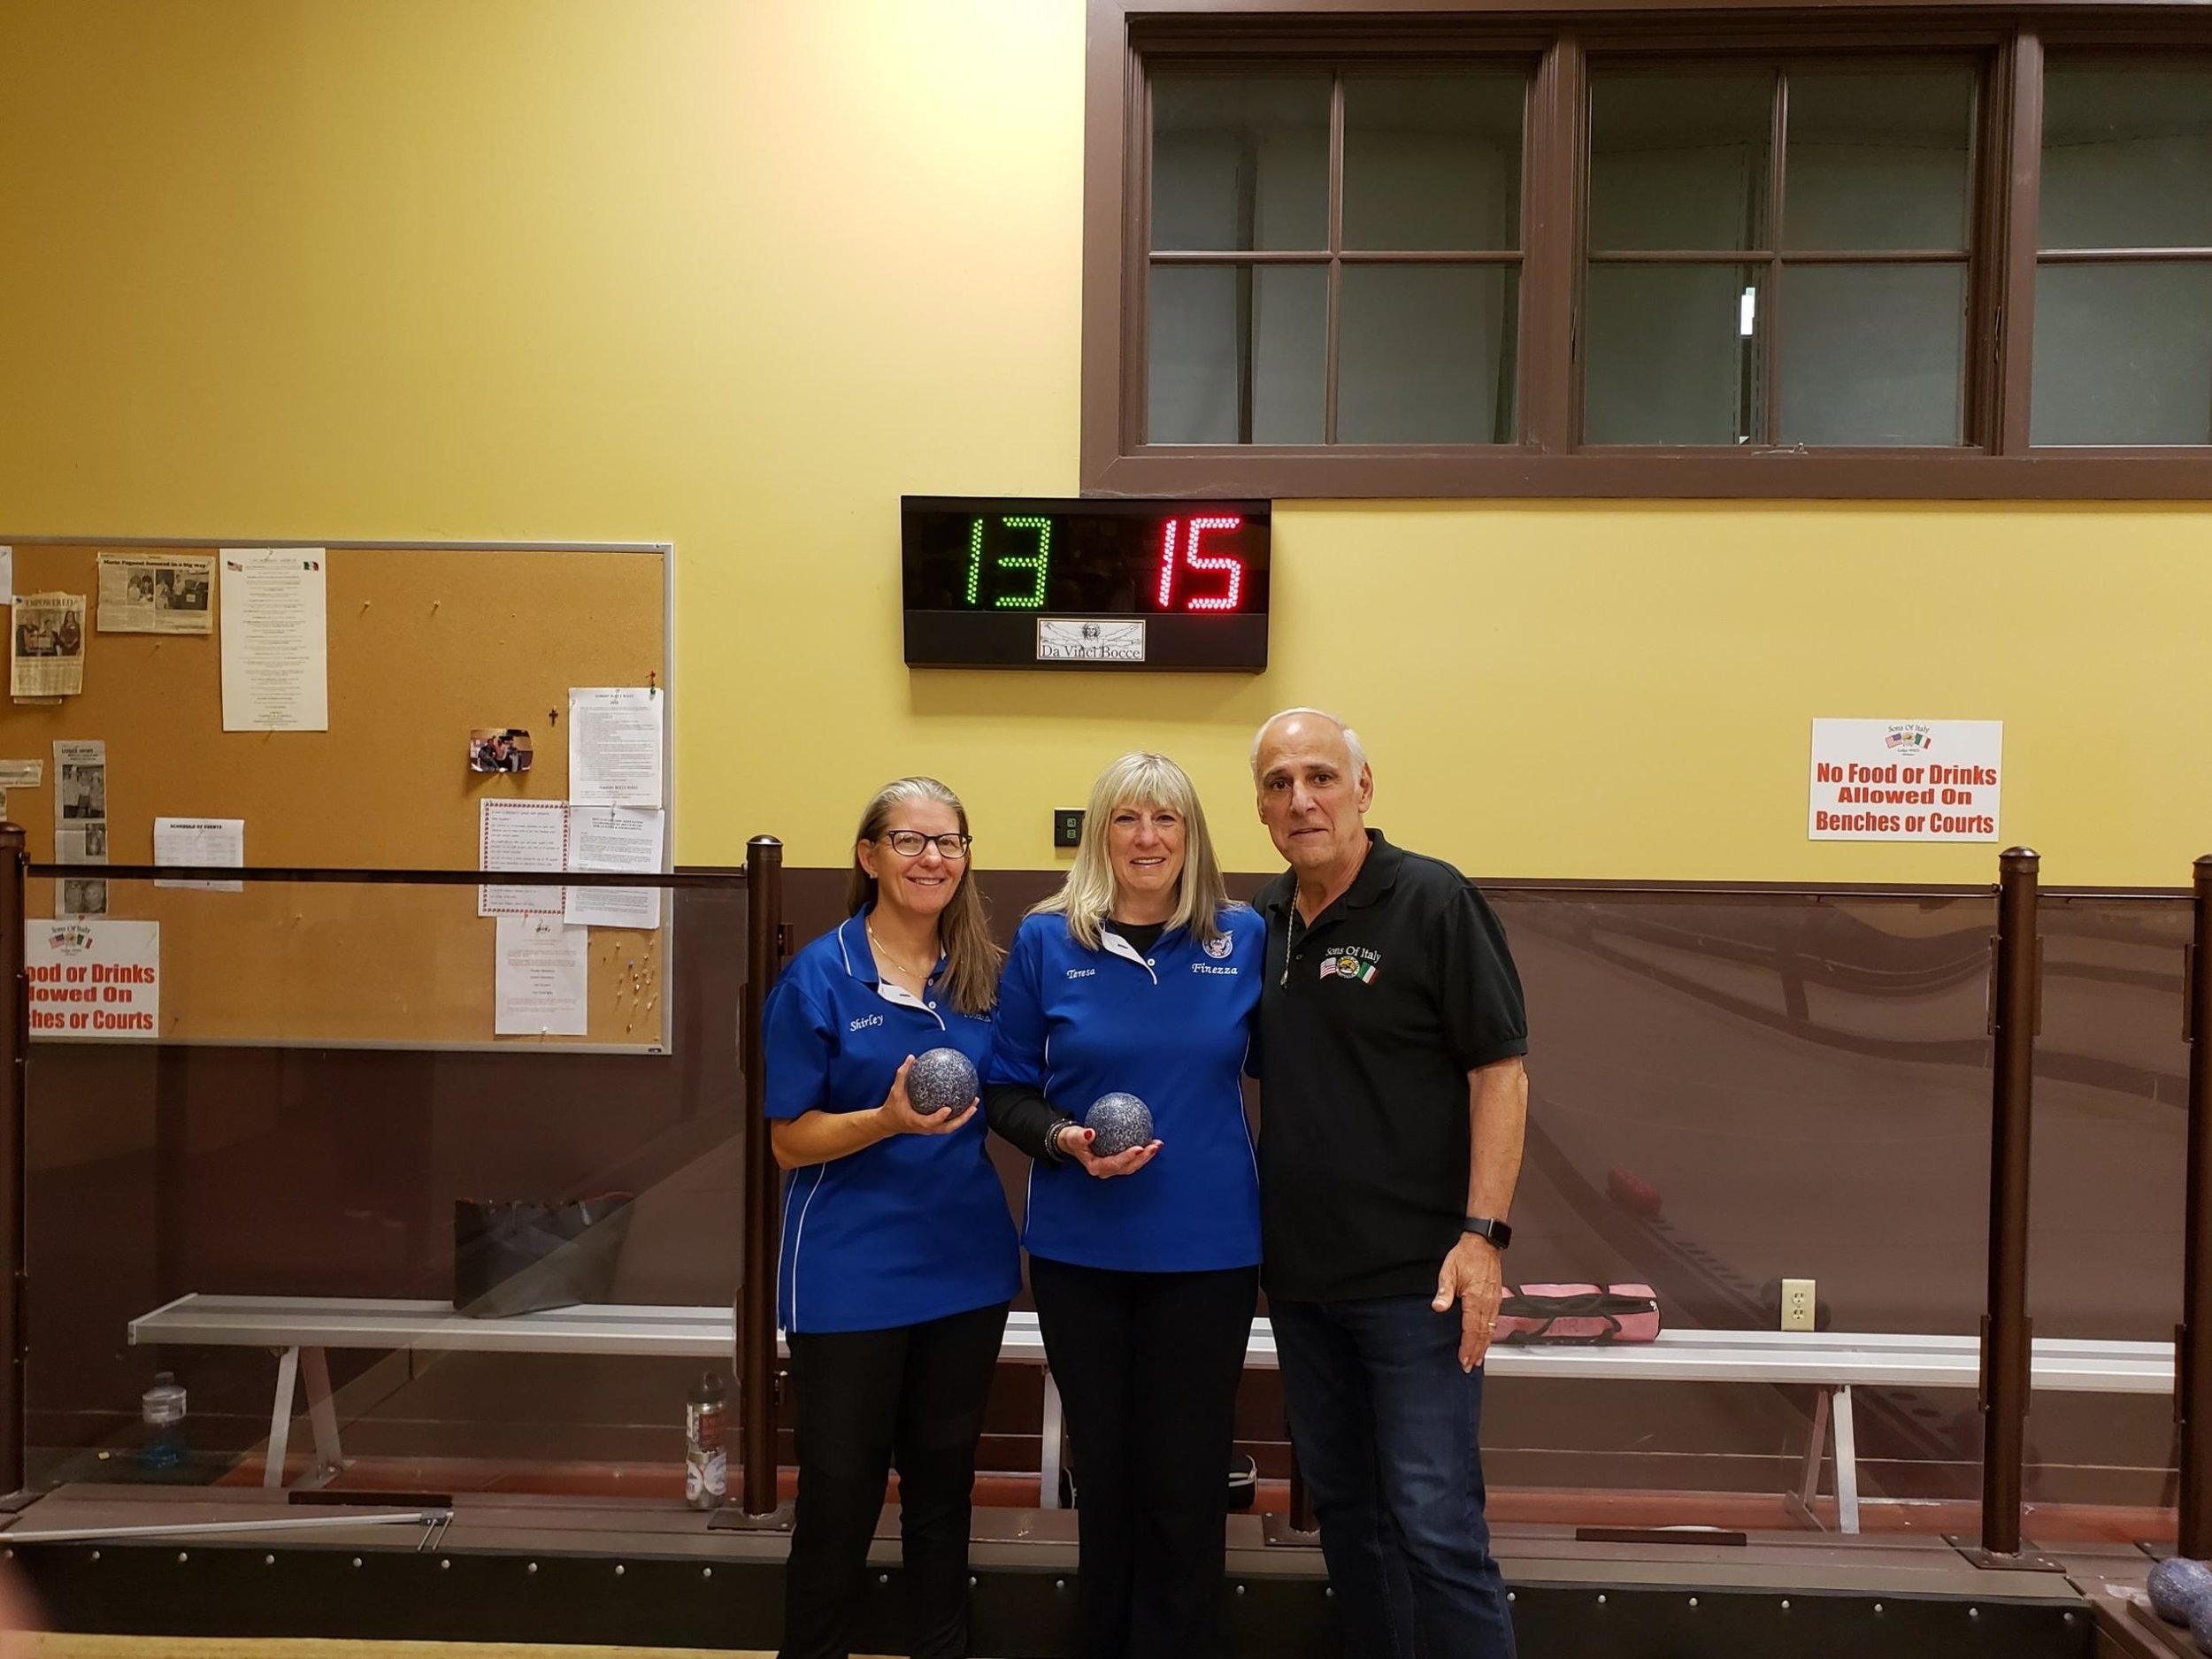 2019 United States Bocce Federation Women's Doubles Punto Raffa Volo Champions! Jolene Kramer (Left) and Teresa Rea ( Right)